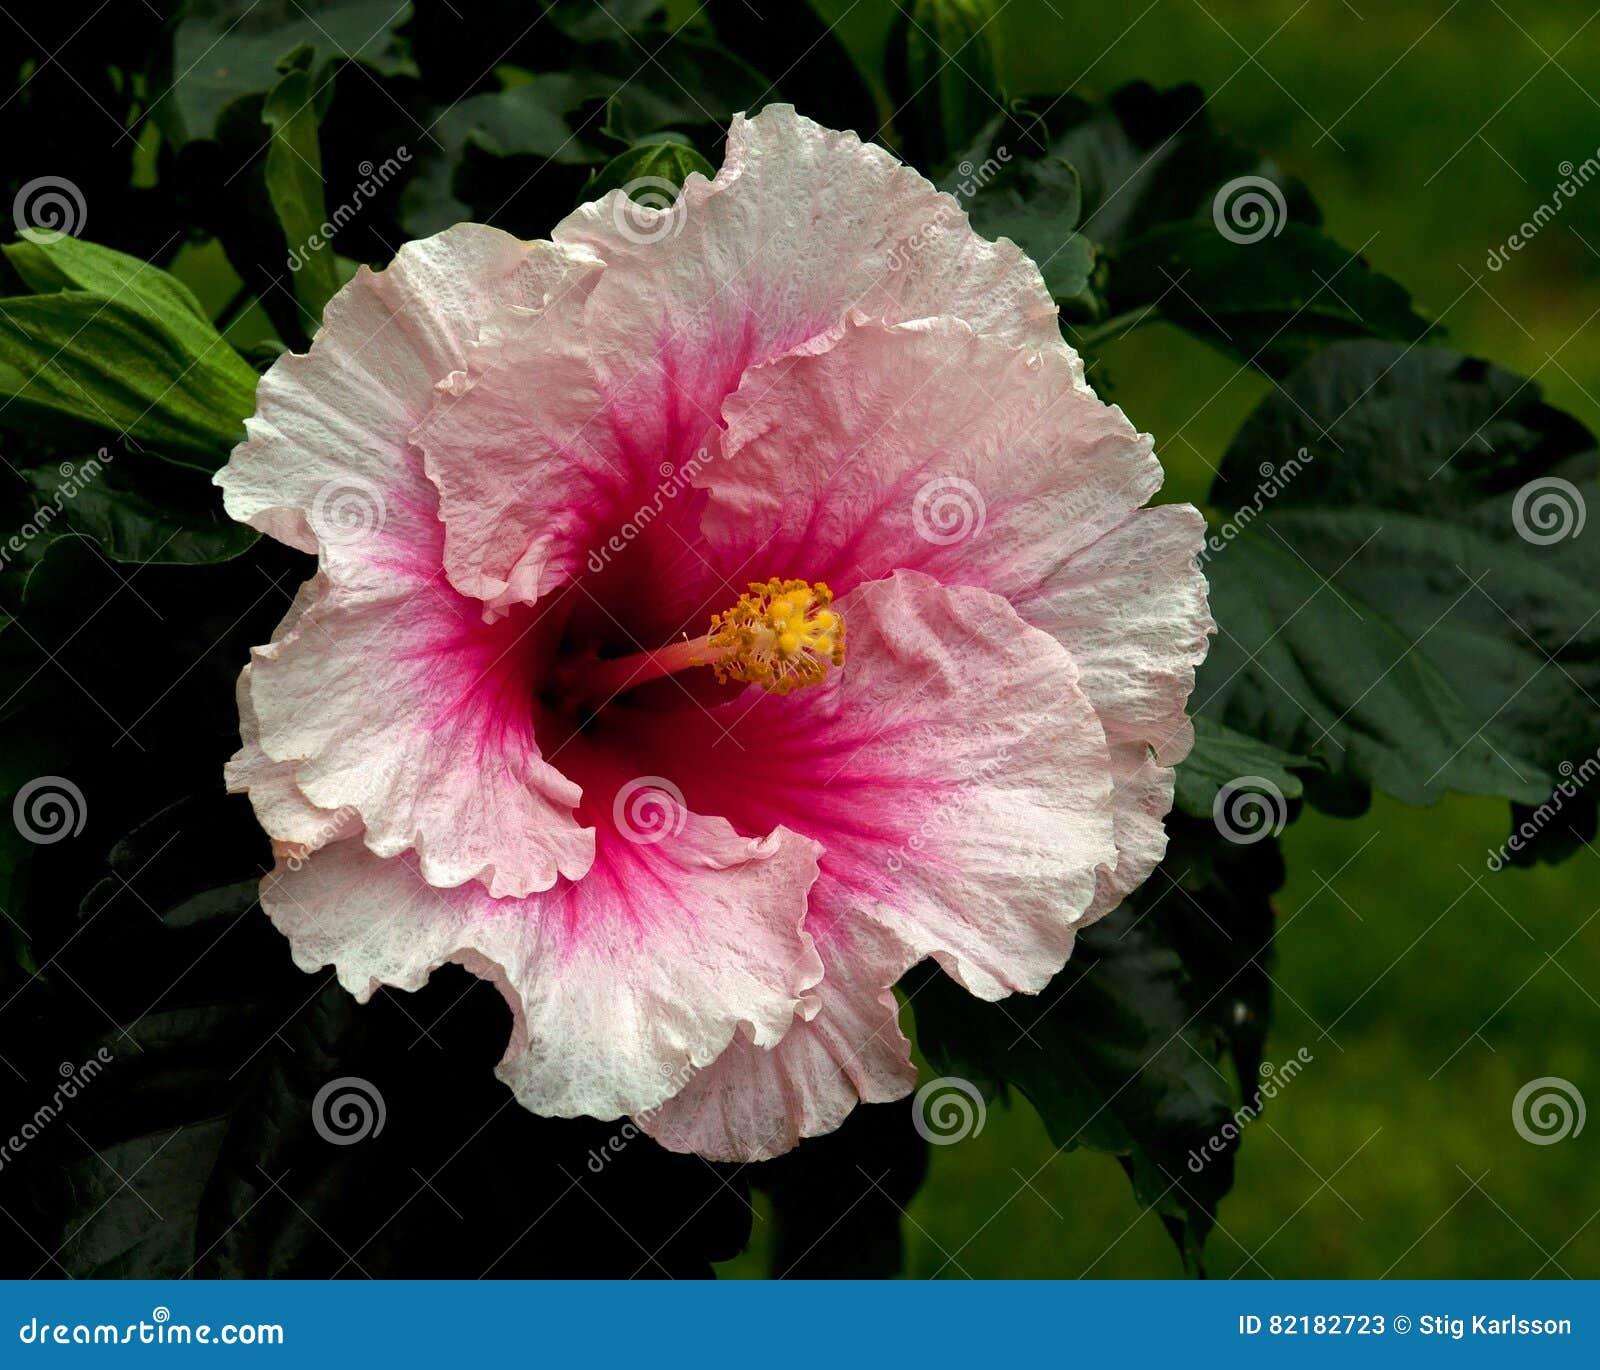 Hibiscus hawaiirose rosa adonicus stock image image of florida download comp izmirmasajfo